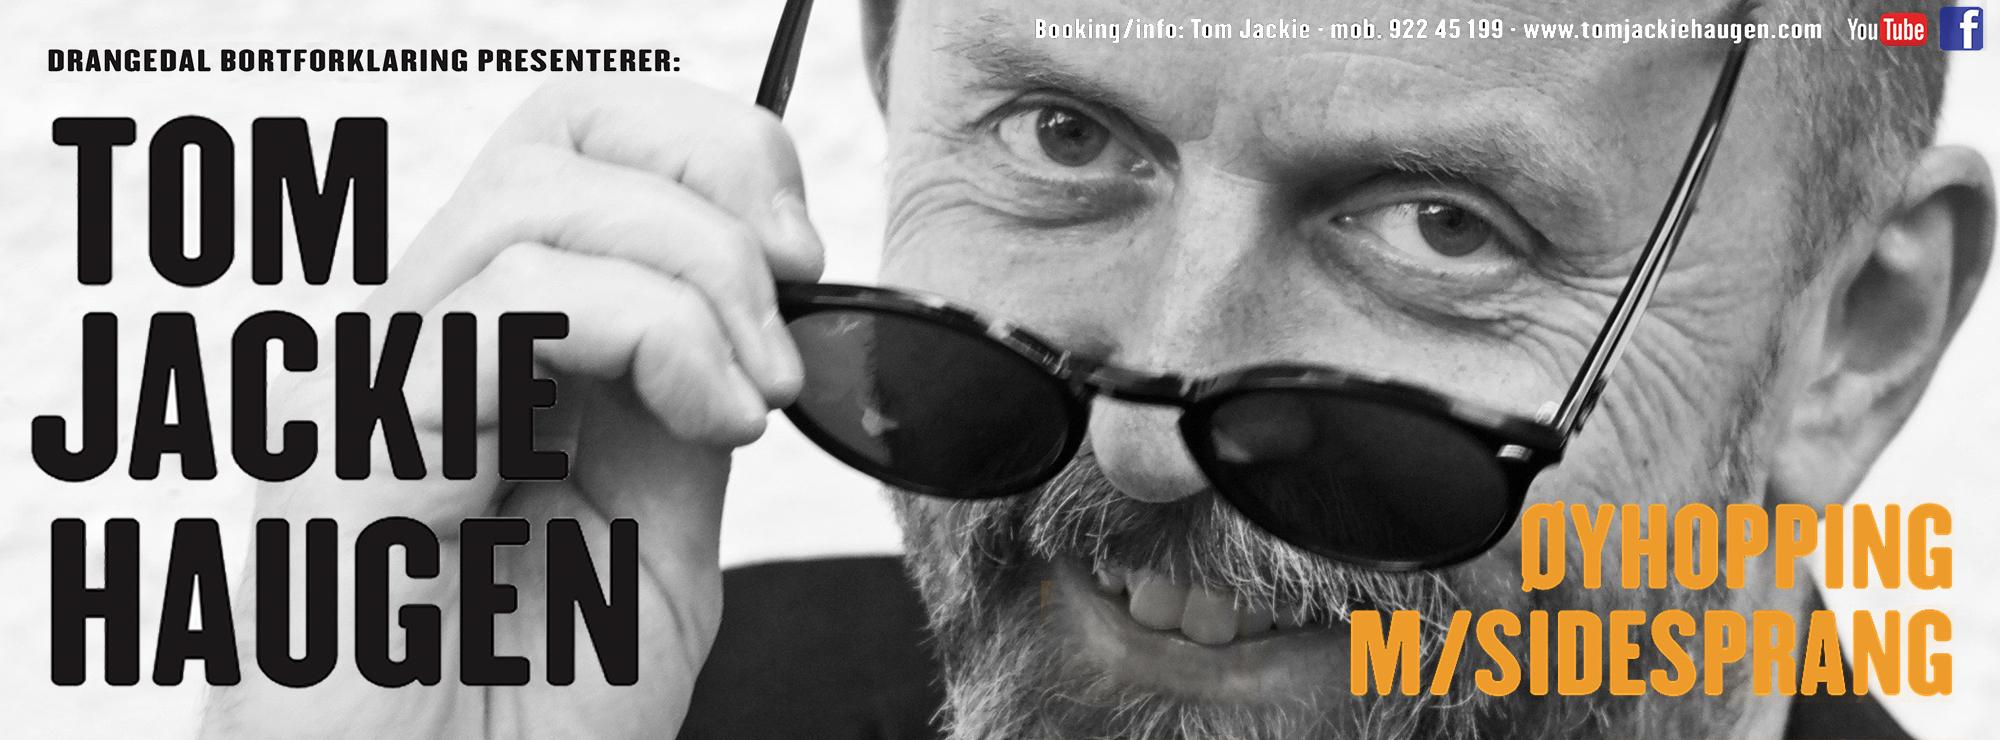 Tom Jackie Haugen: Øyhopping m/sidesprang...